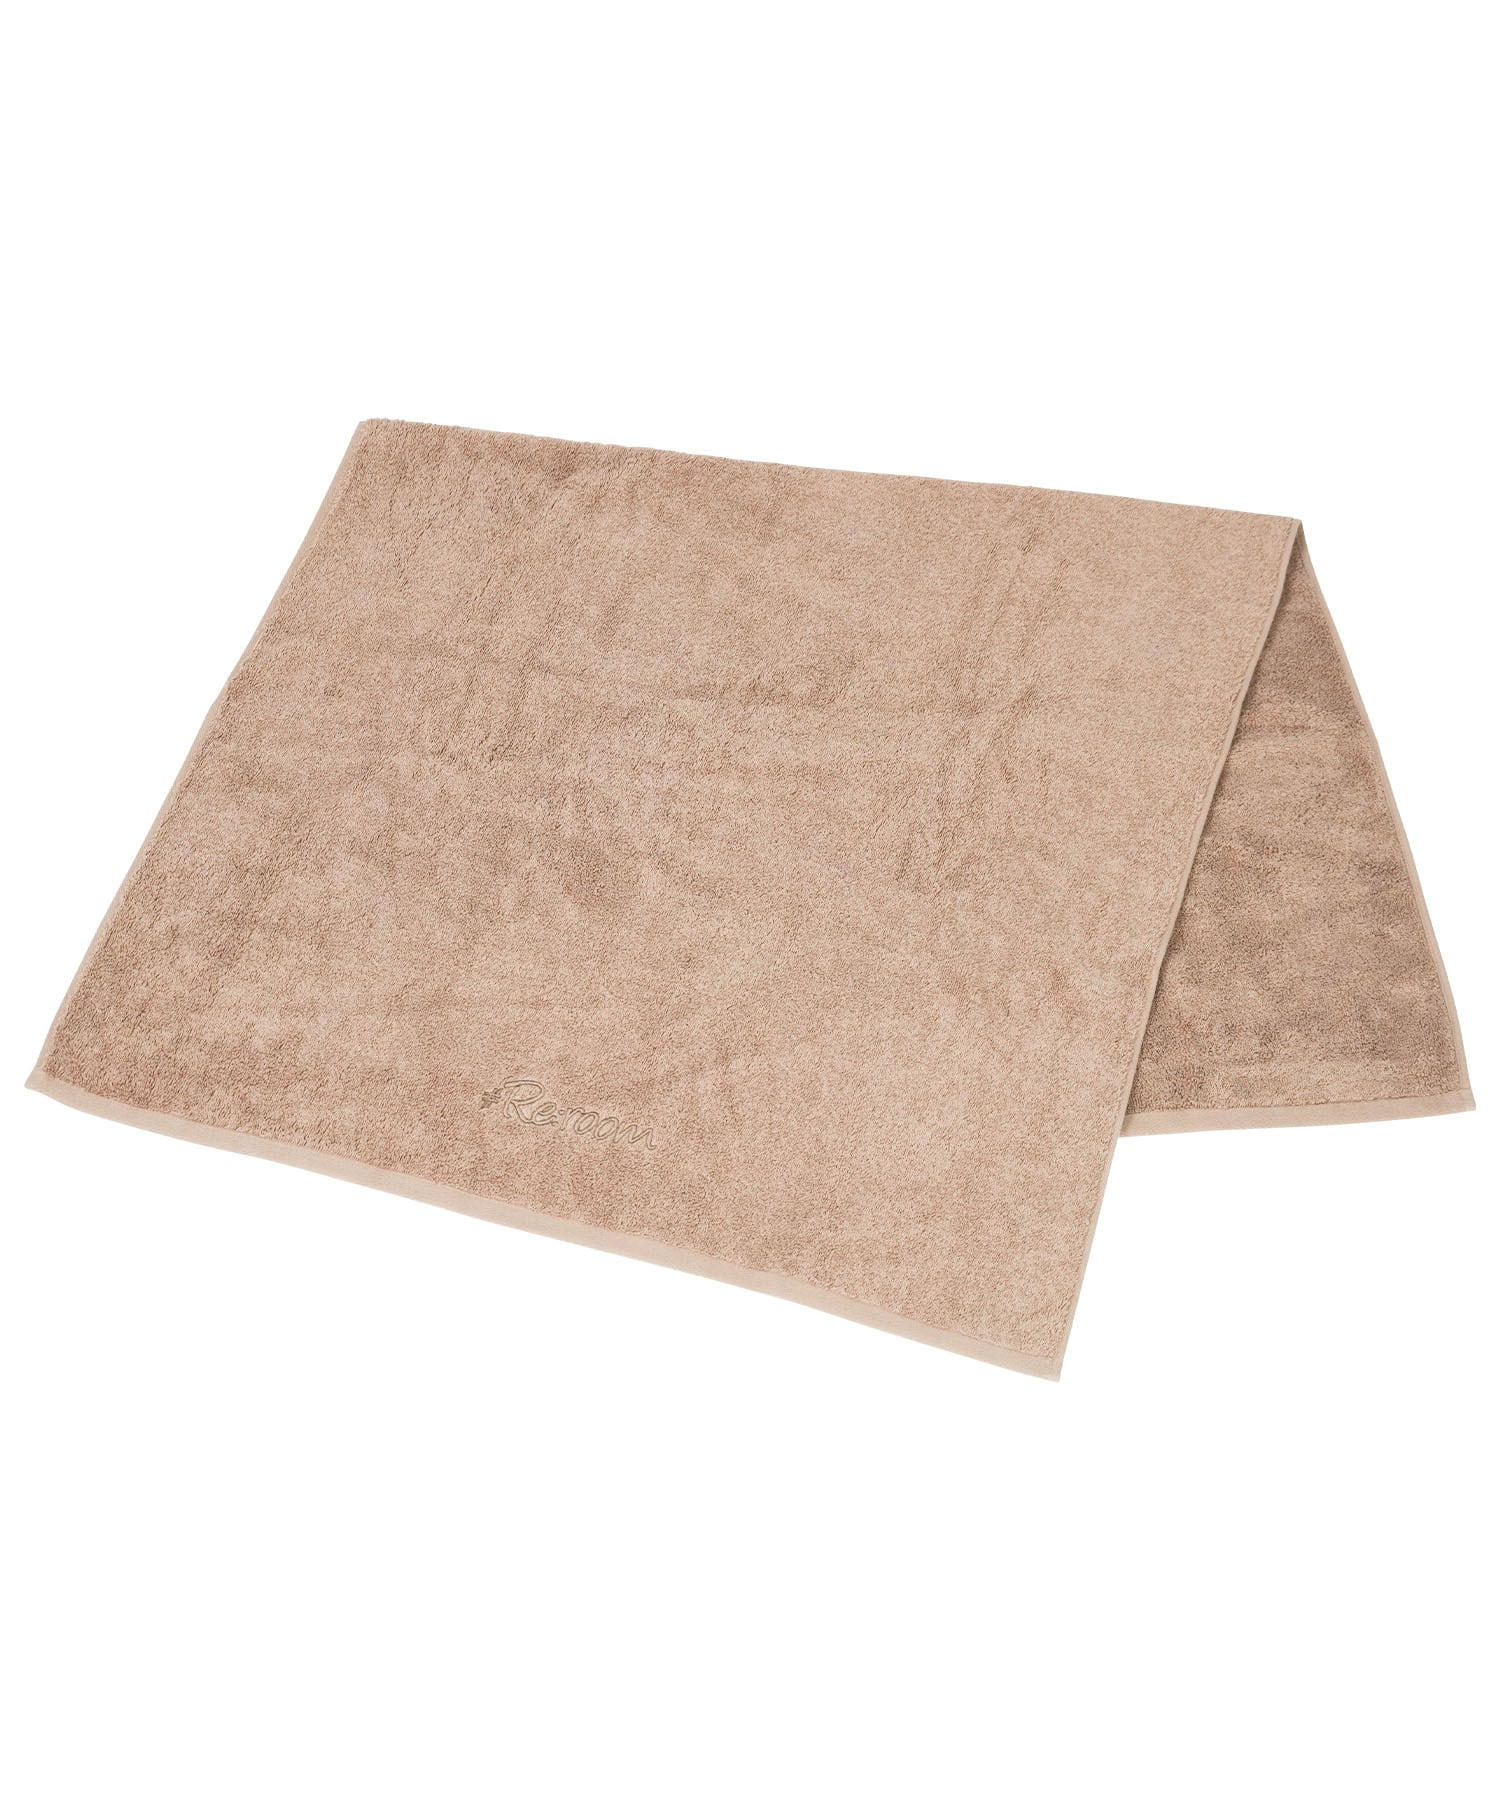 LOGO FRAME EMBROIDERY BATH TOWEL[REG128]